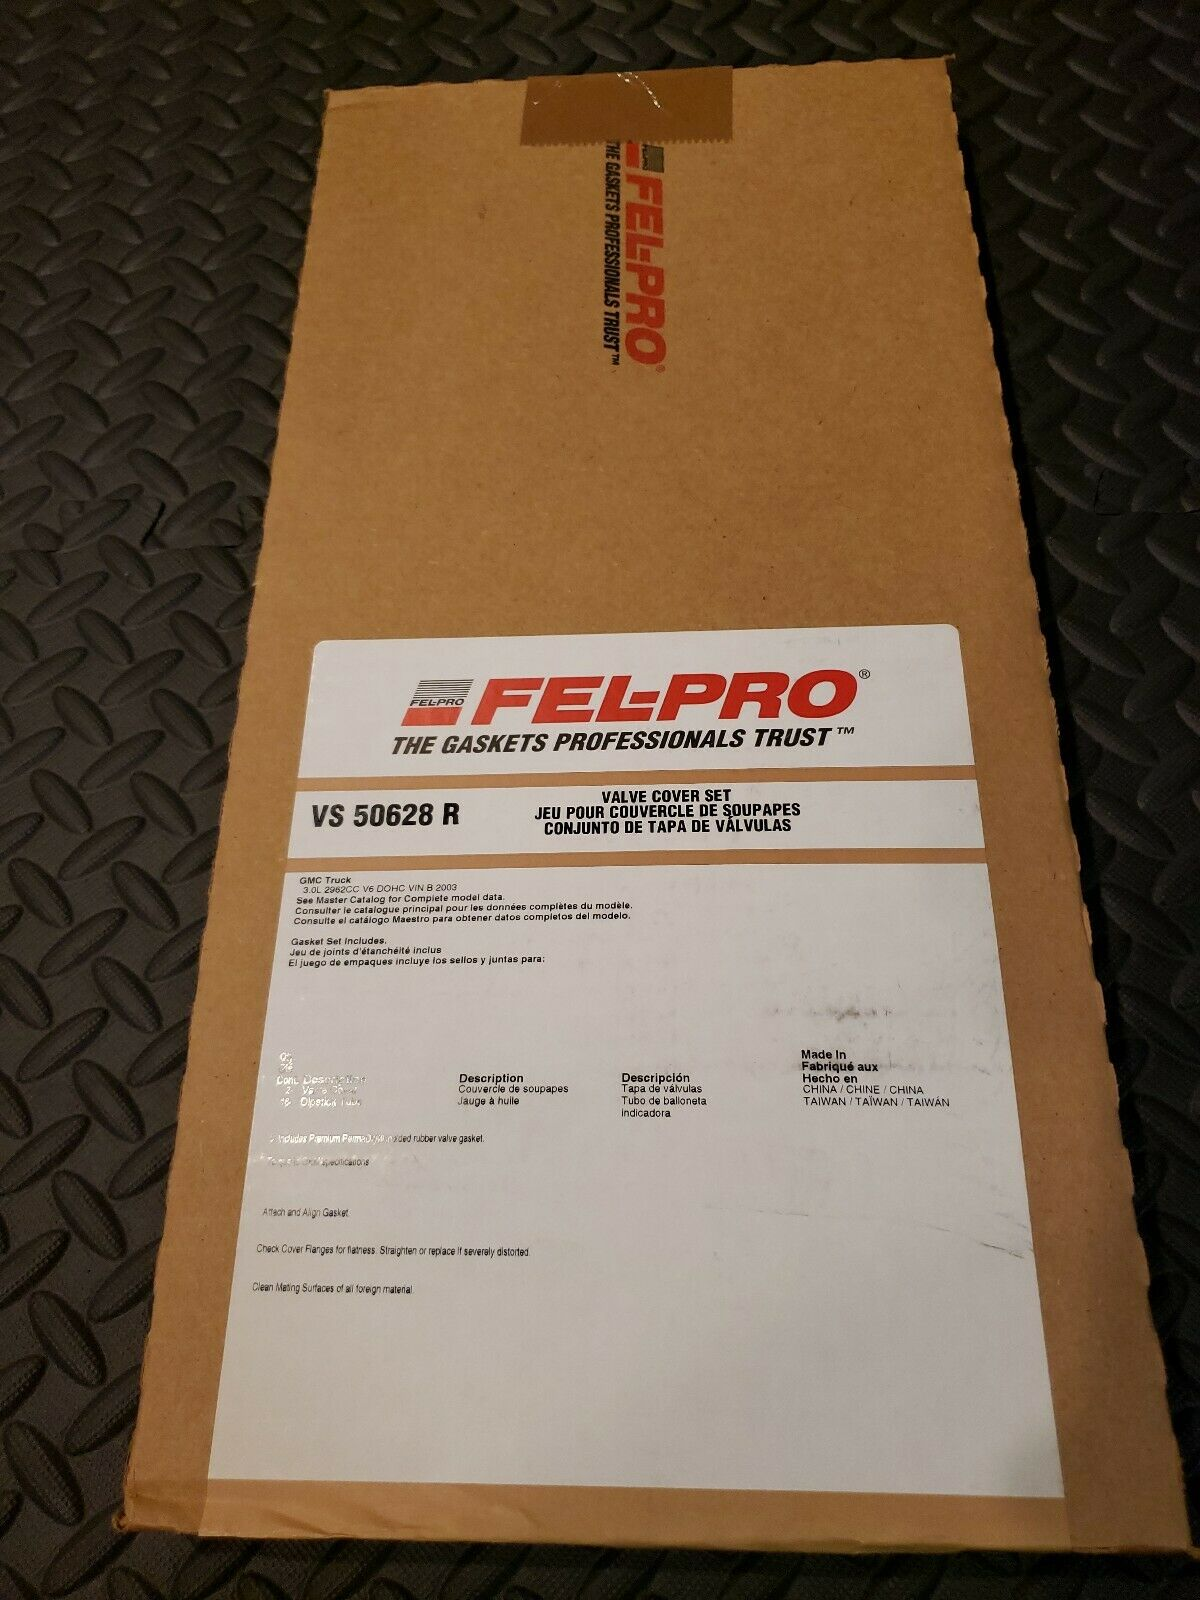 Engine Sealing ge Fel-Pro VS 50628 R Valve Cover Gasket Set FelPro VS50628R